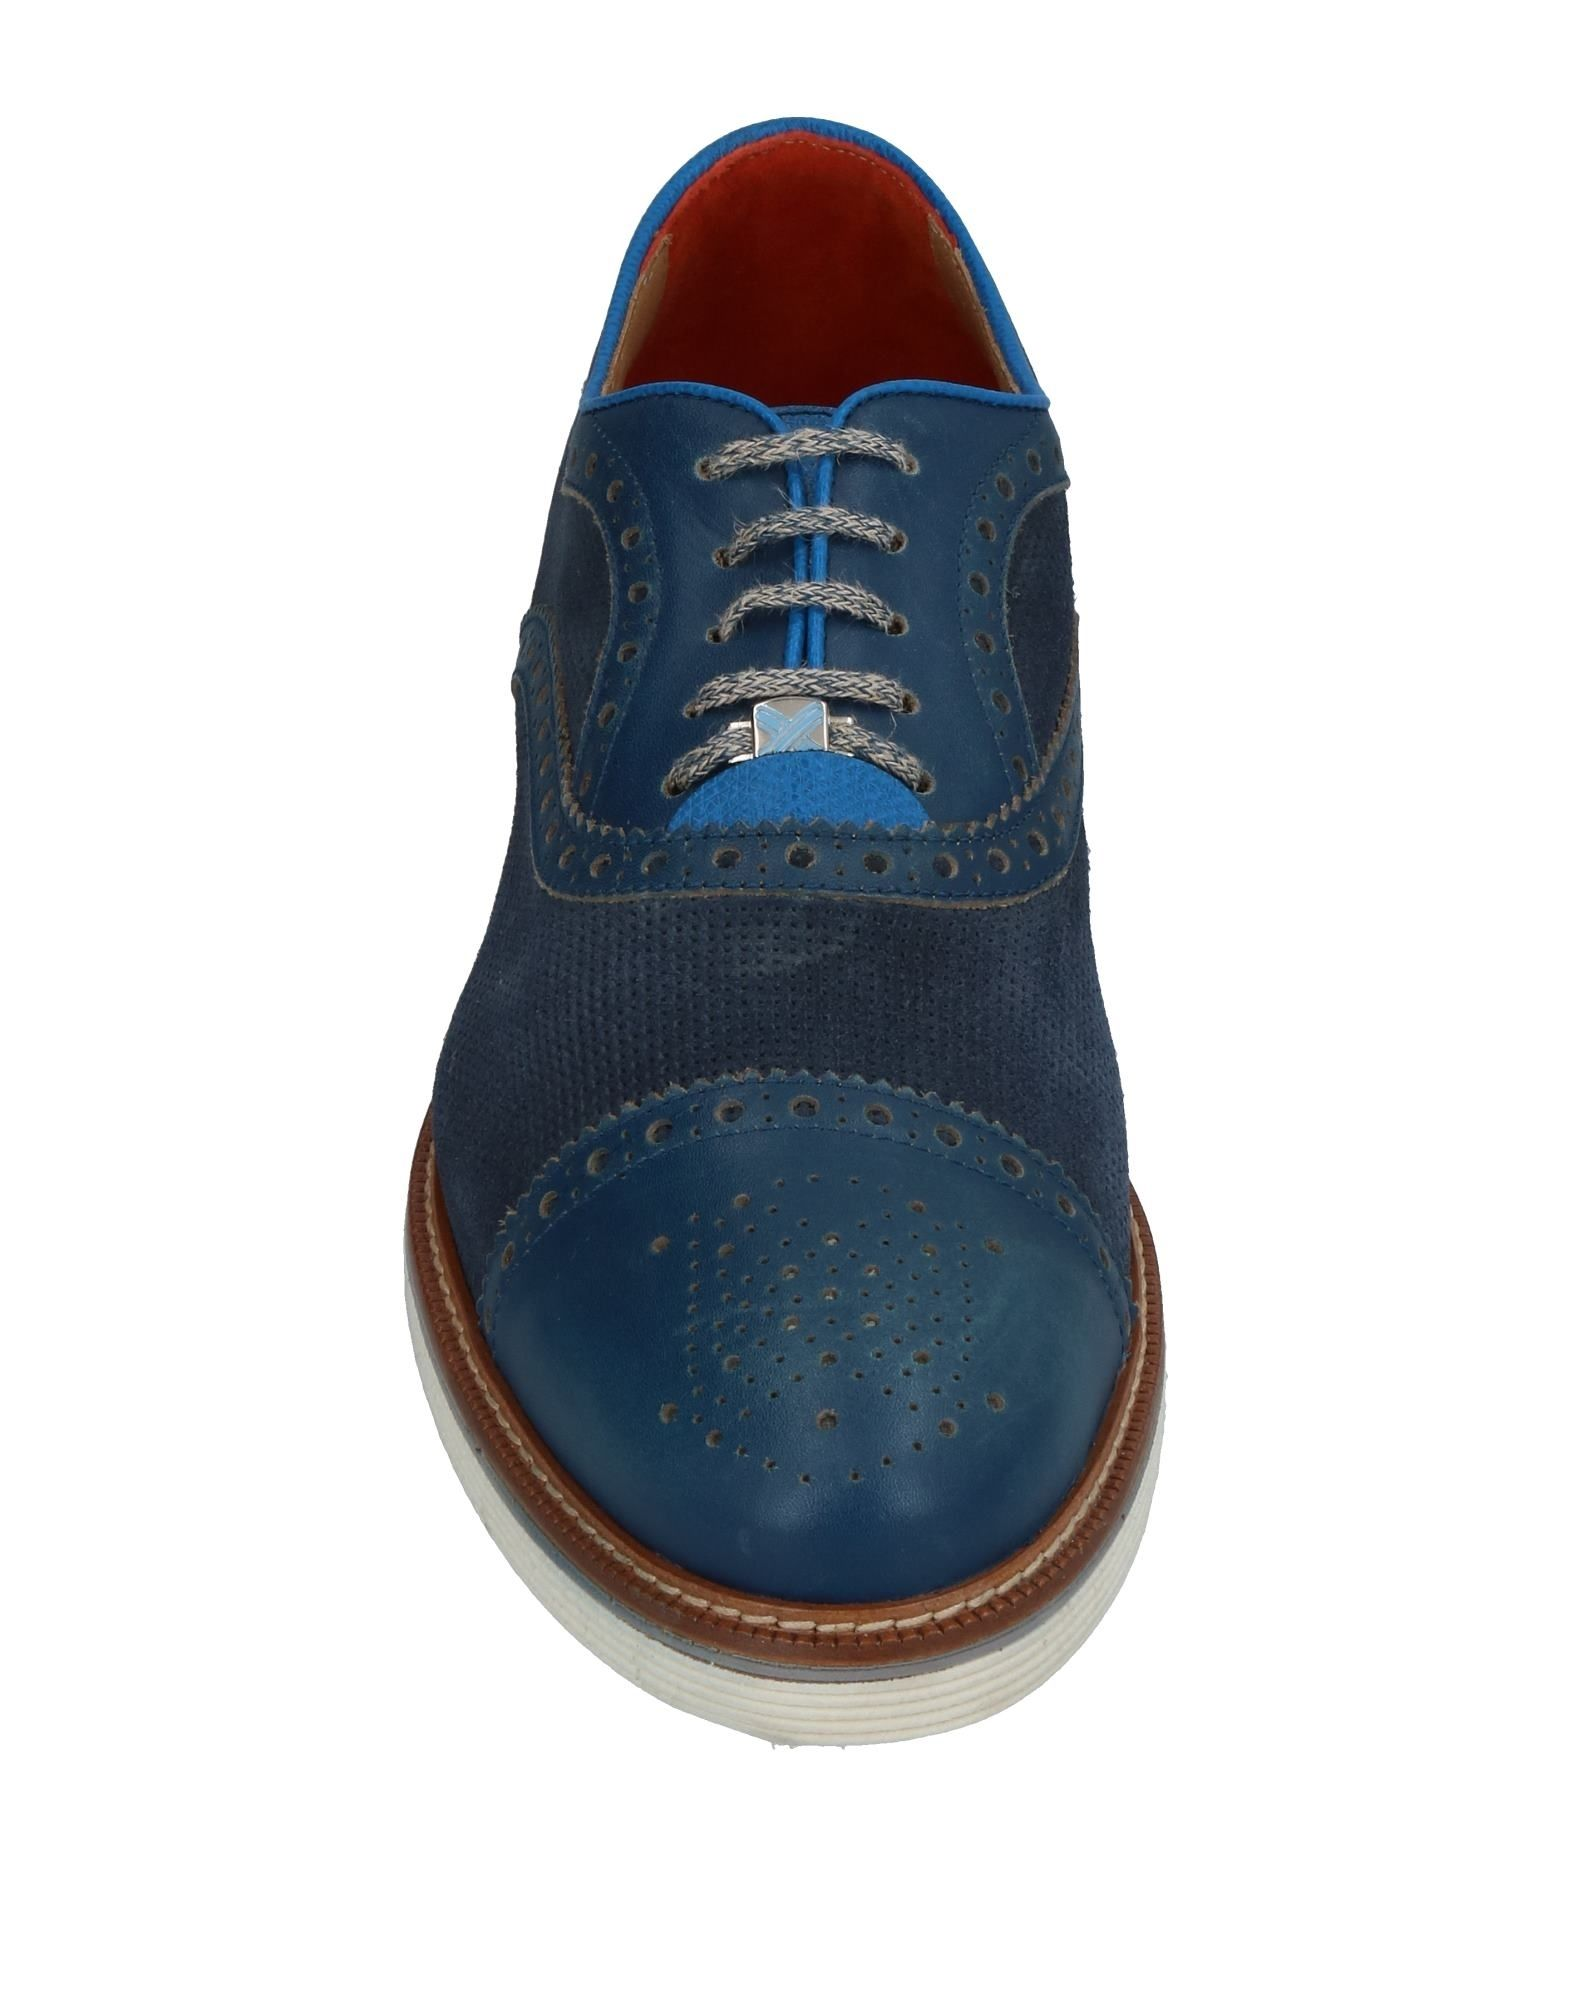 Rabatt echte  Schuhe Brimarts Schnürschuhe Herren  echte 11399974WW 87c77f